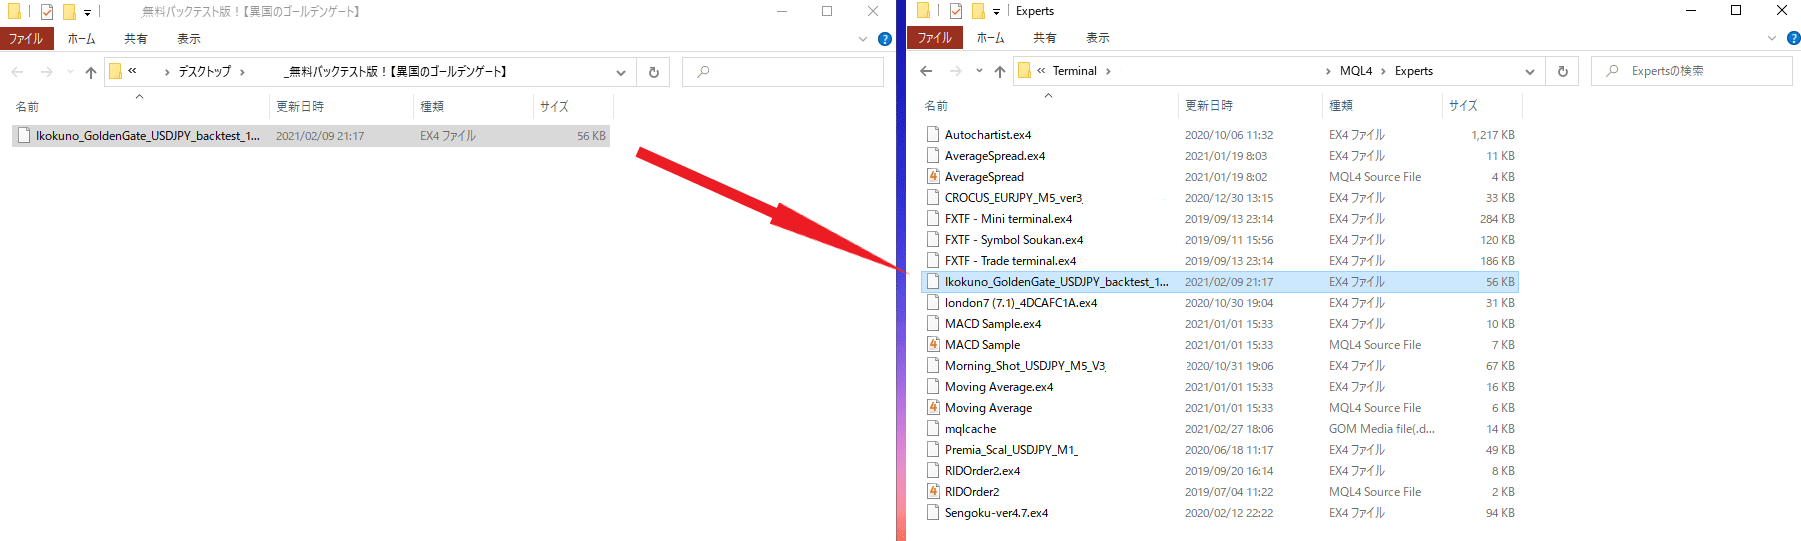 EX4ファイル移動